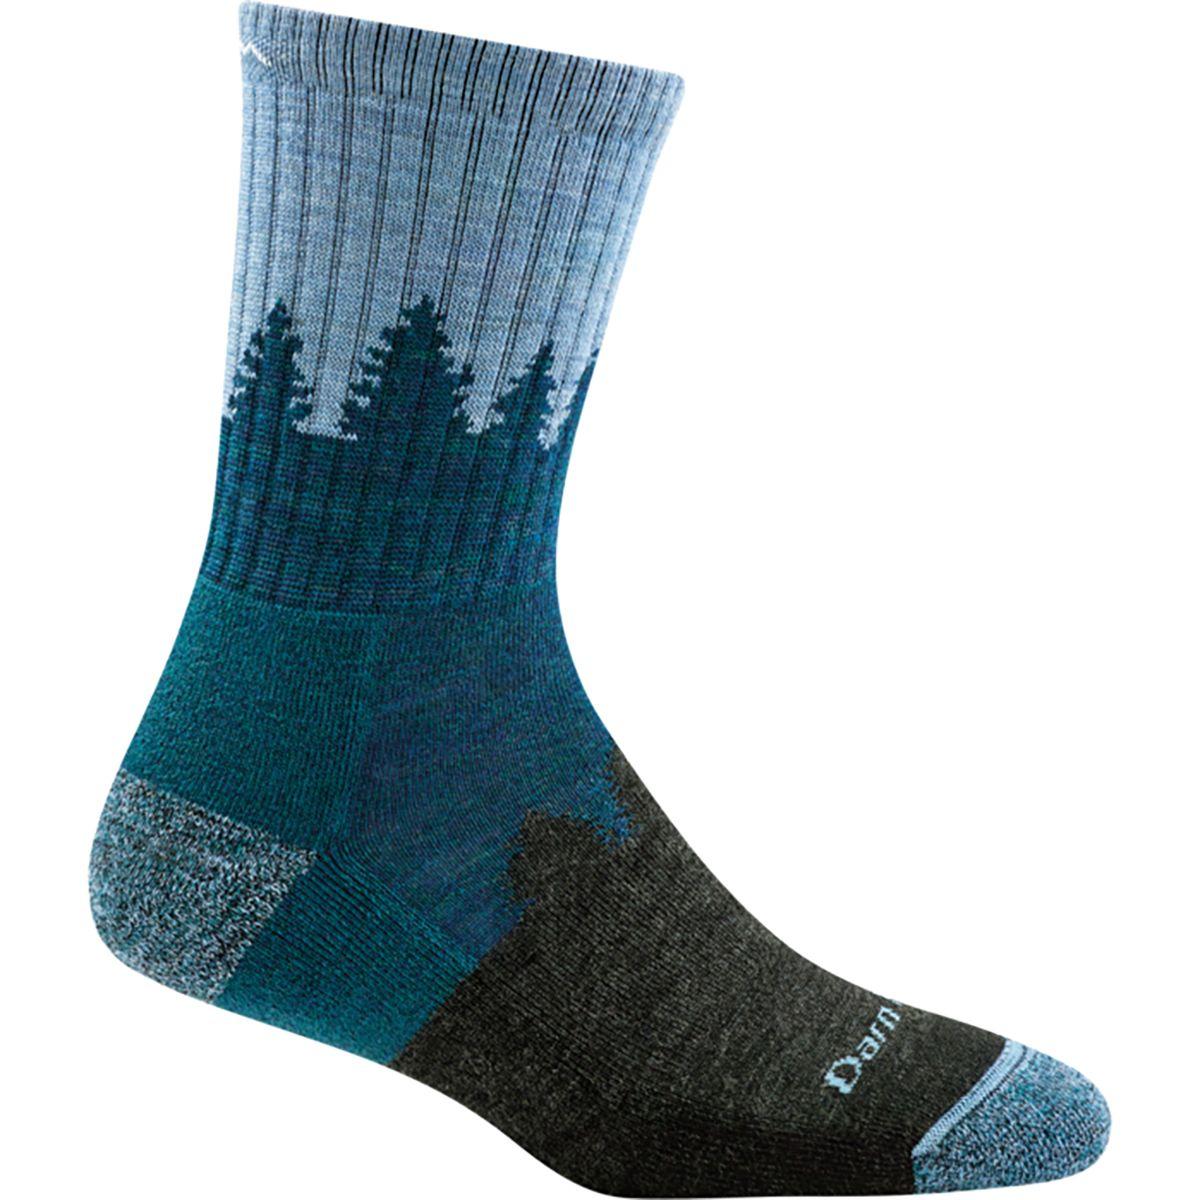 Treeline Micro Crew Cushion Sock - Women